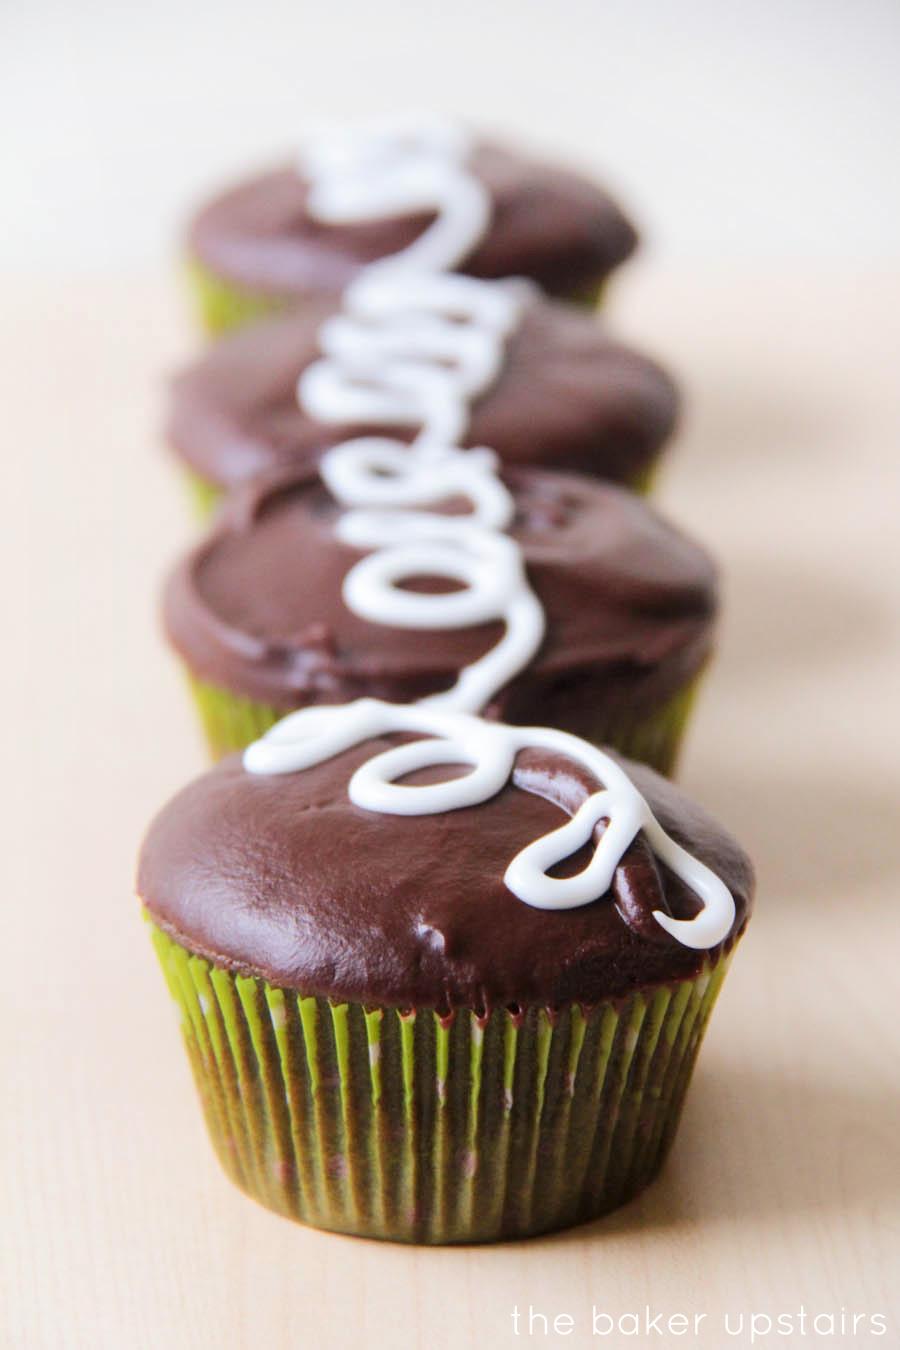 the baker upstairs: homemade hostess cupcakes